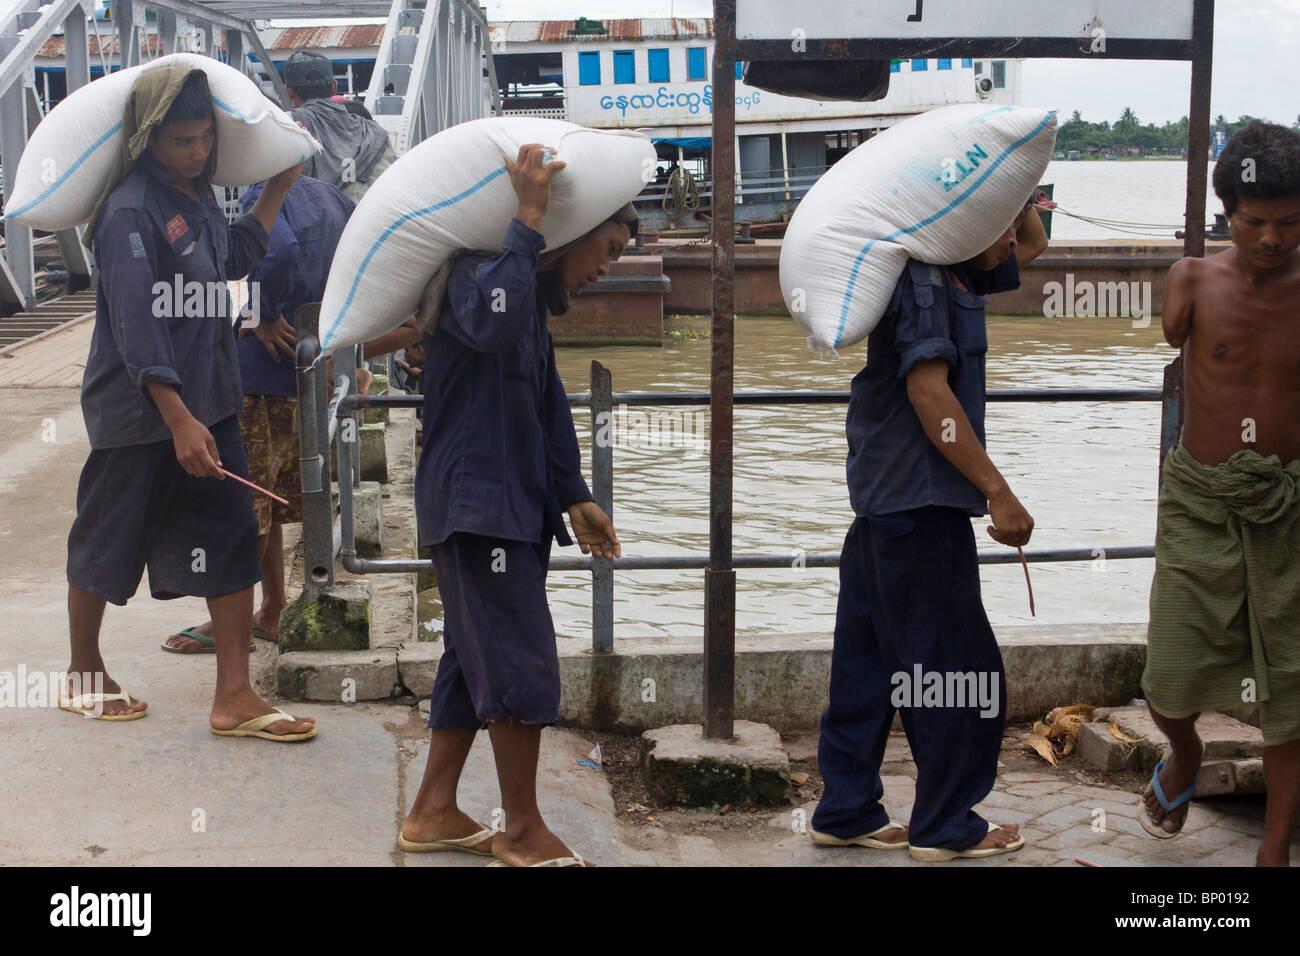 manual labourers carying sacks, Yangon docks, Myanmar - Stock Image